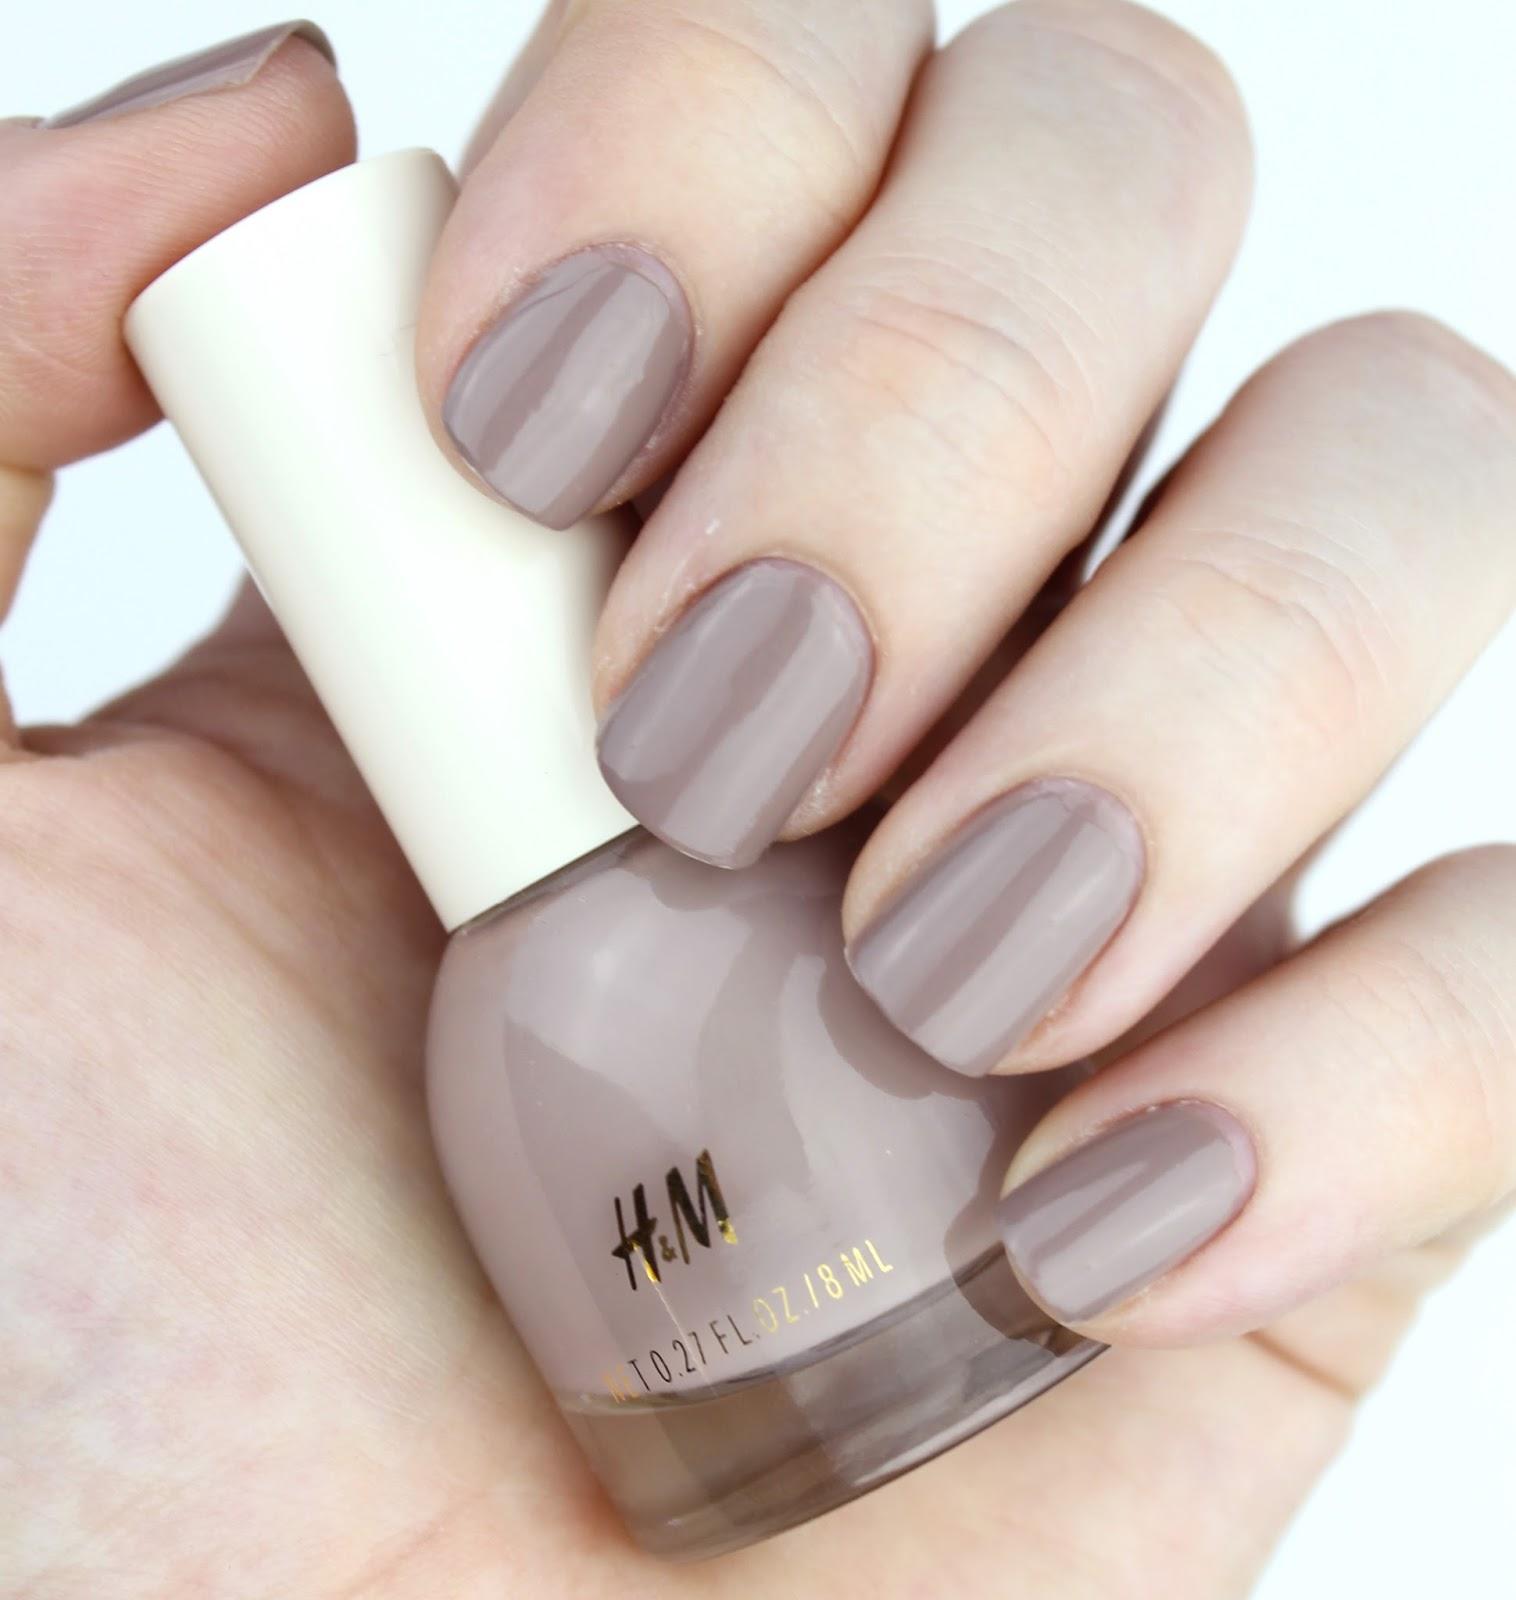 Greige Nail Polish: H&M Nail Polishes